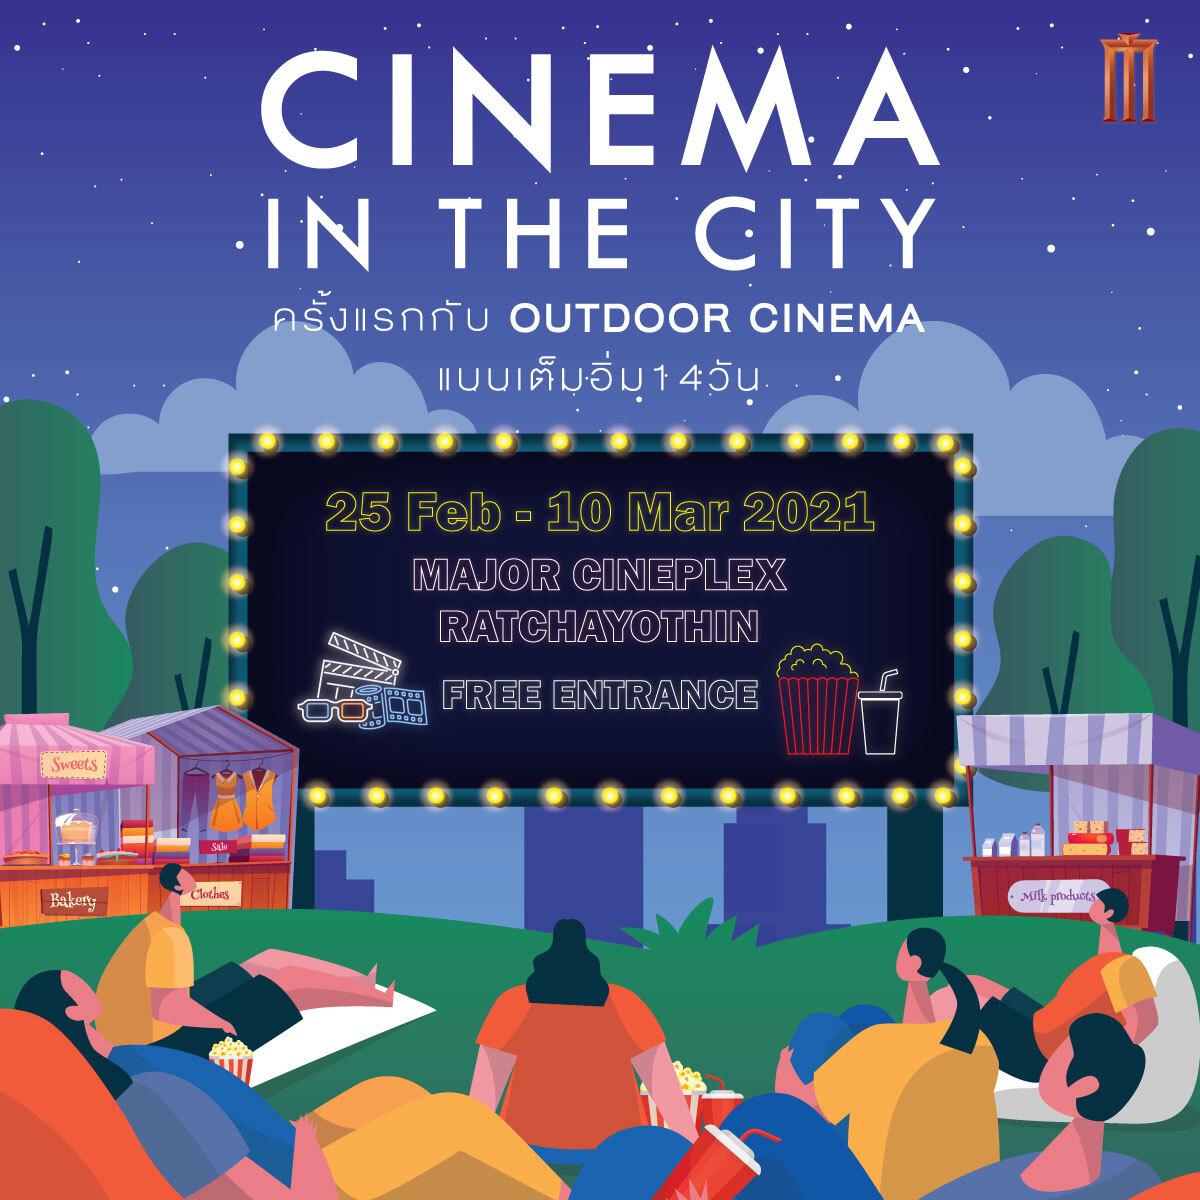 CINEMA IN THE CITY ครั้งแรกในรูปแบบ Outdoor Cinema ดูฟรี 14 วัน